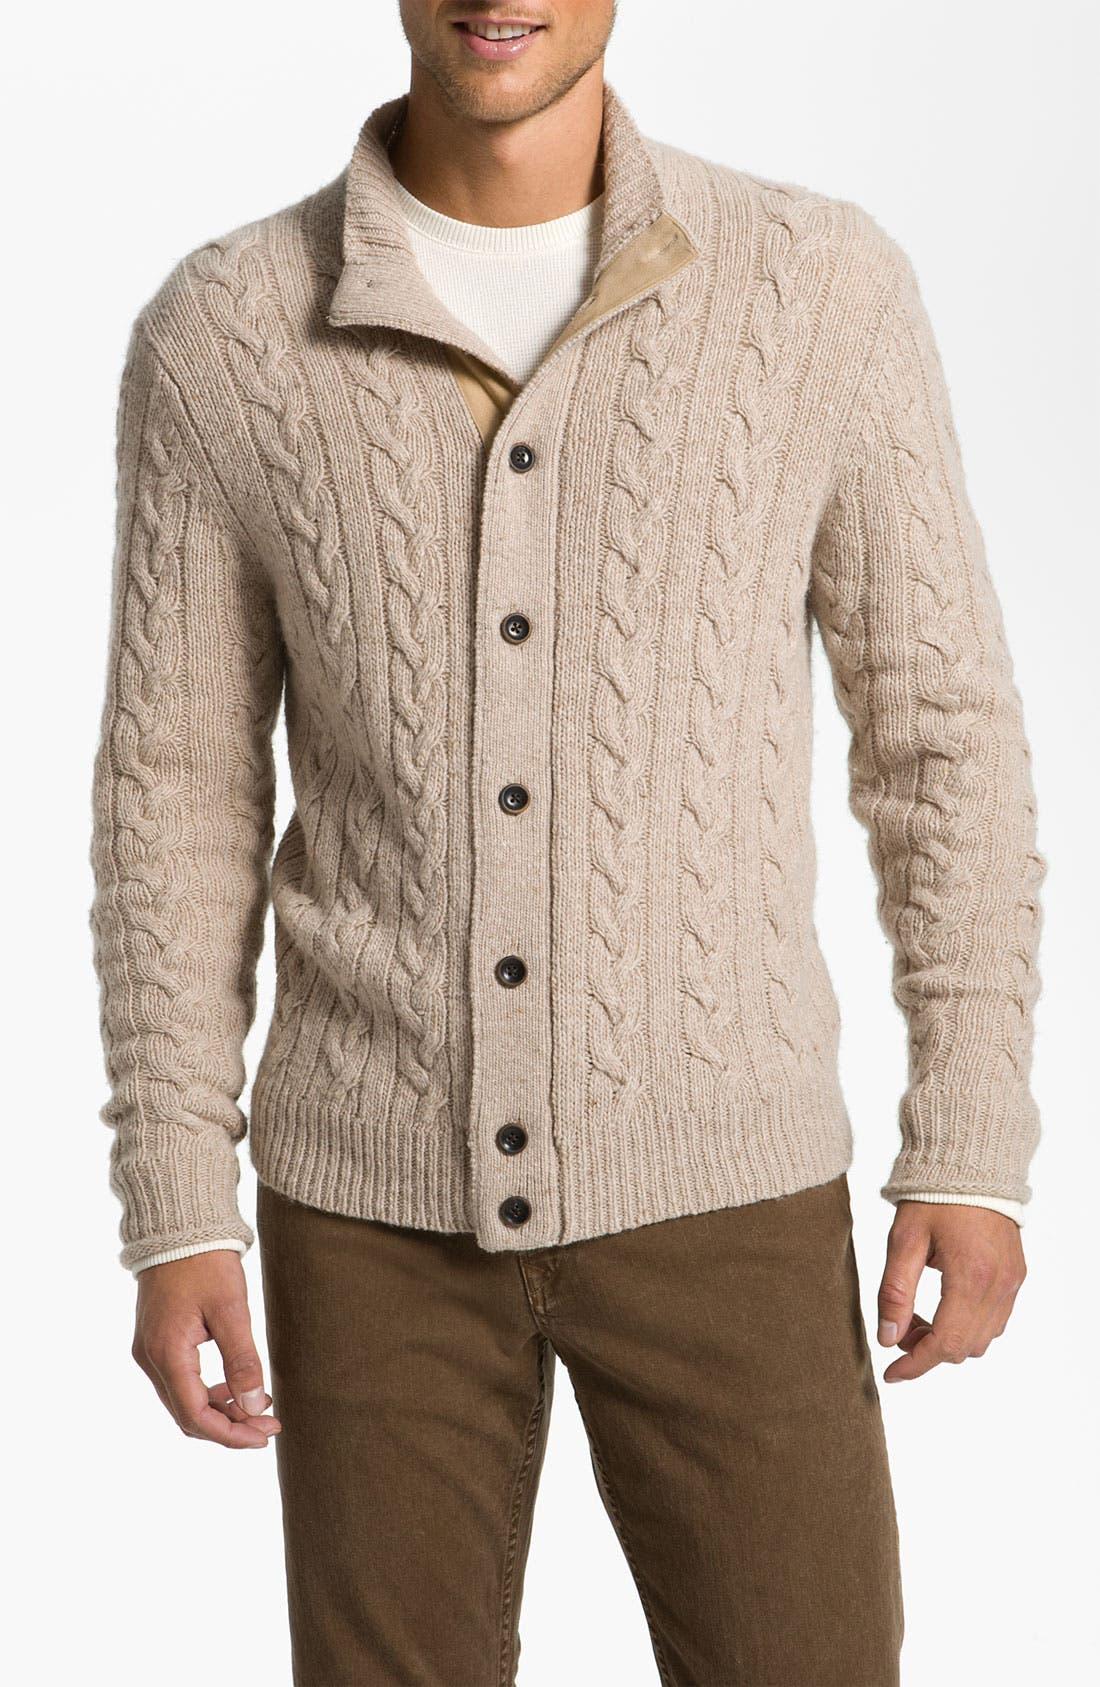 Main Image - Hickey Freeman Cable Knit Merino Wool Blend Cardigan